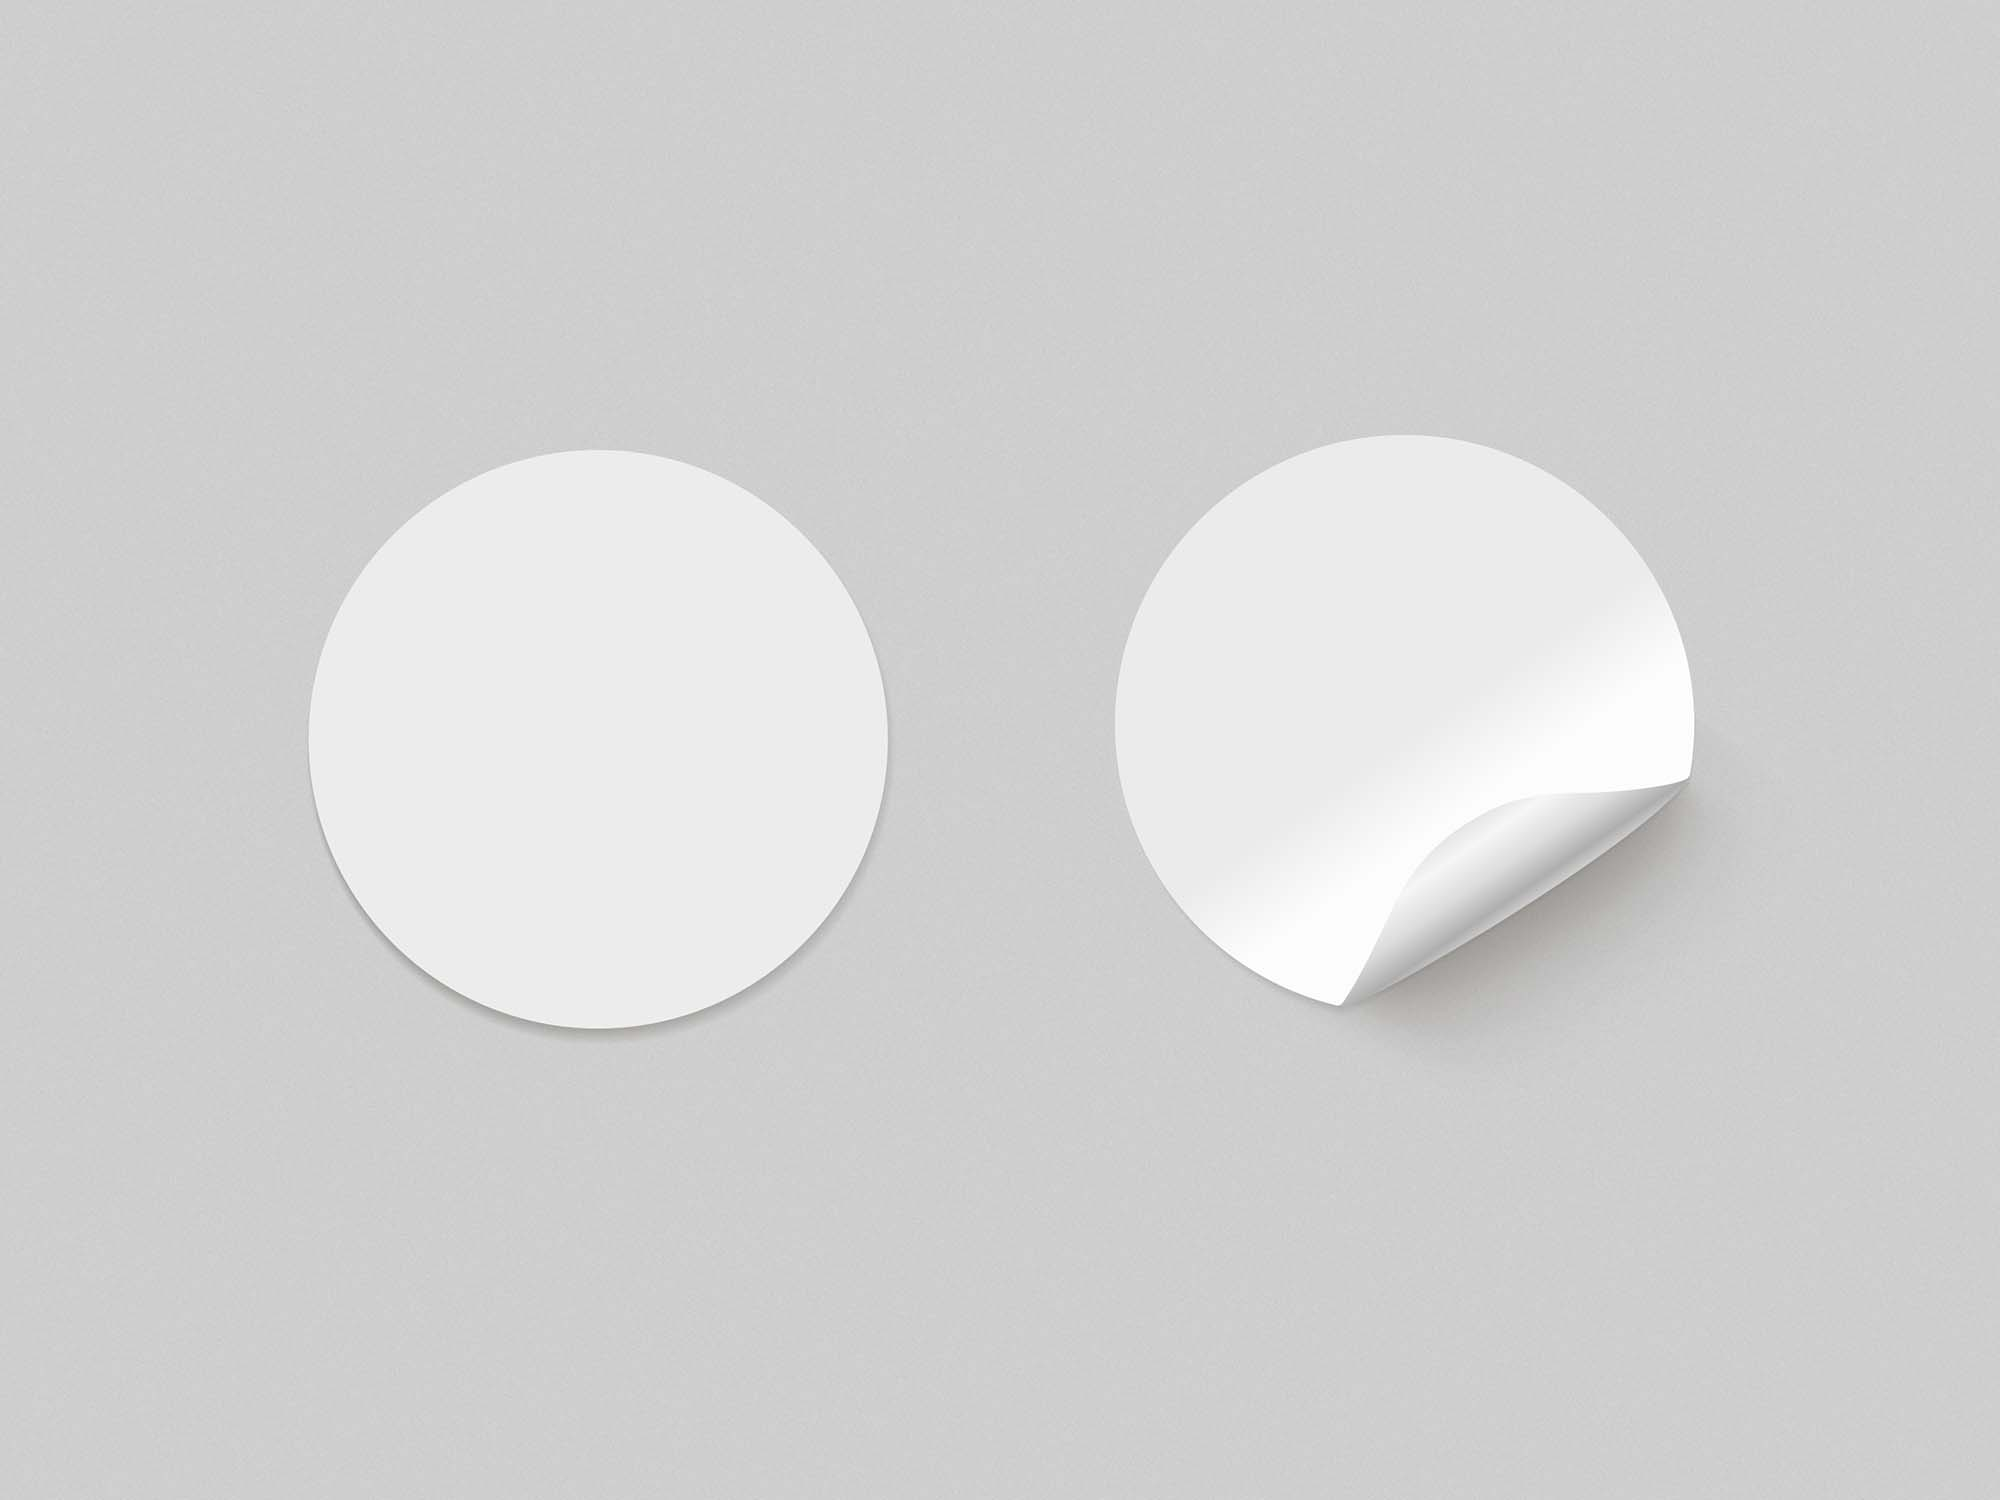 Round Paper Stickers Mockup 2